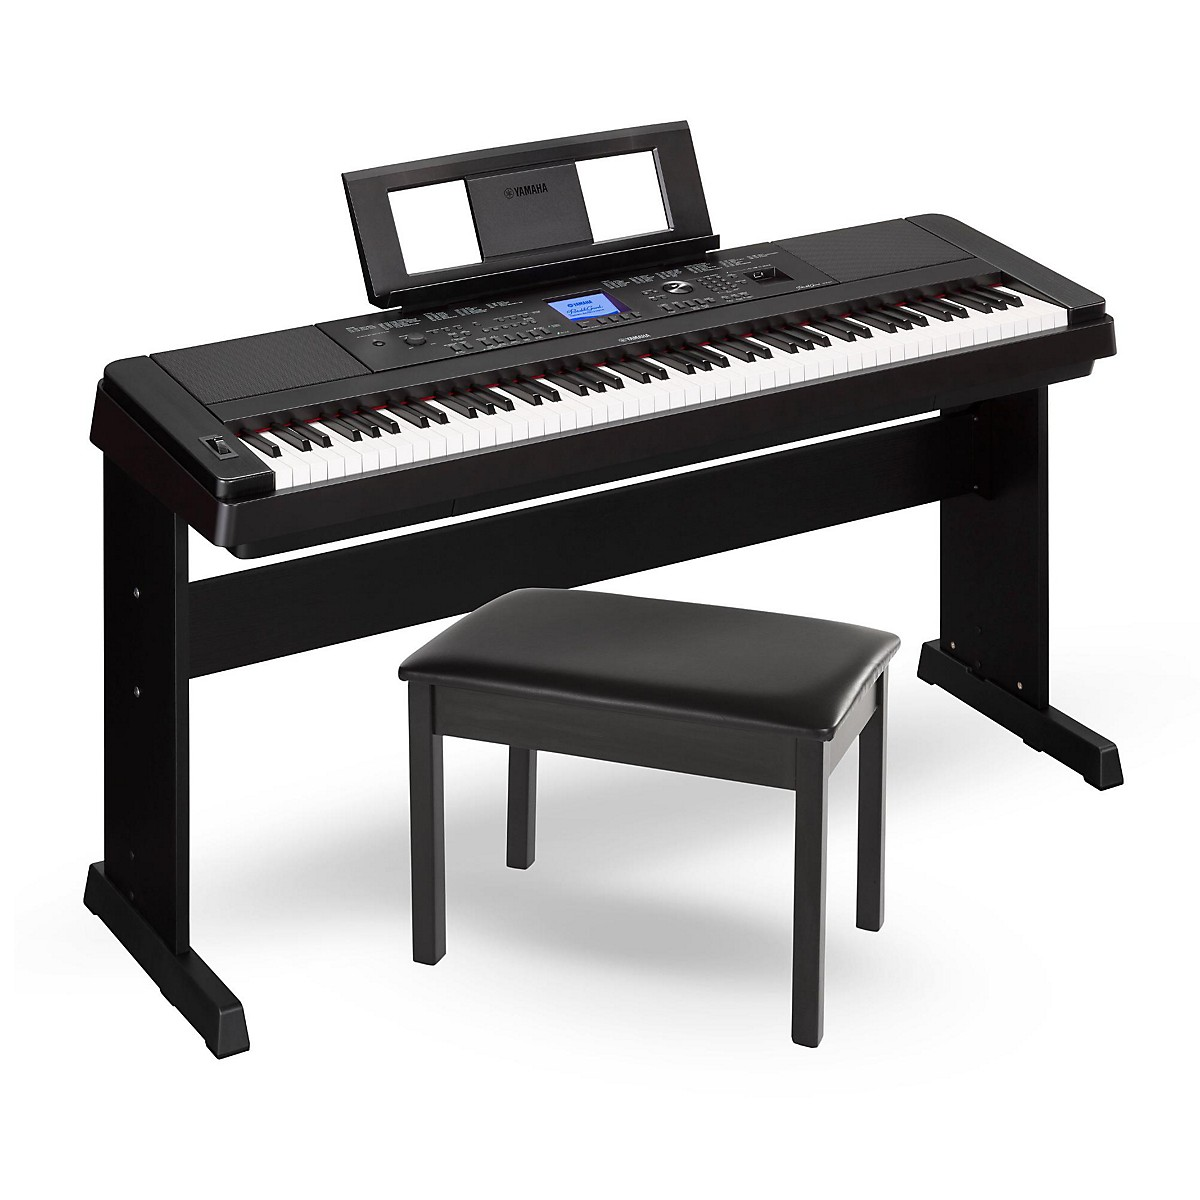 Yamaha DGX-660 88-Key Portable Grand Piano with Bench